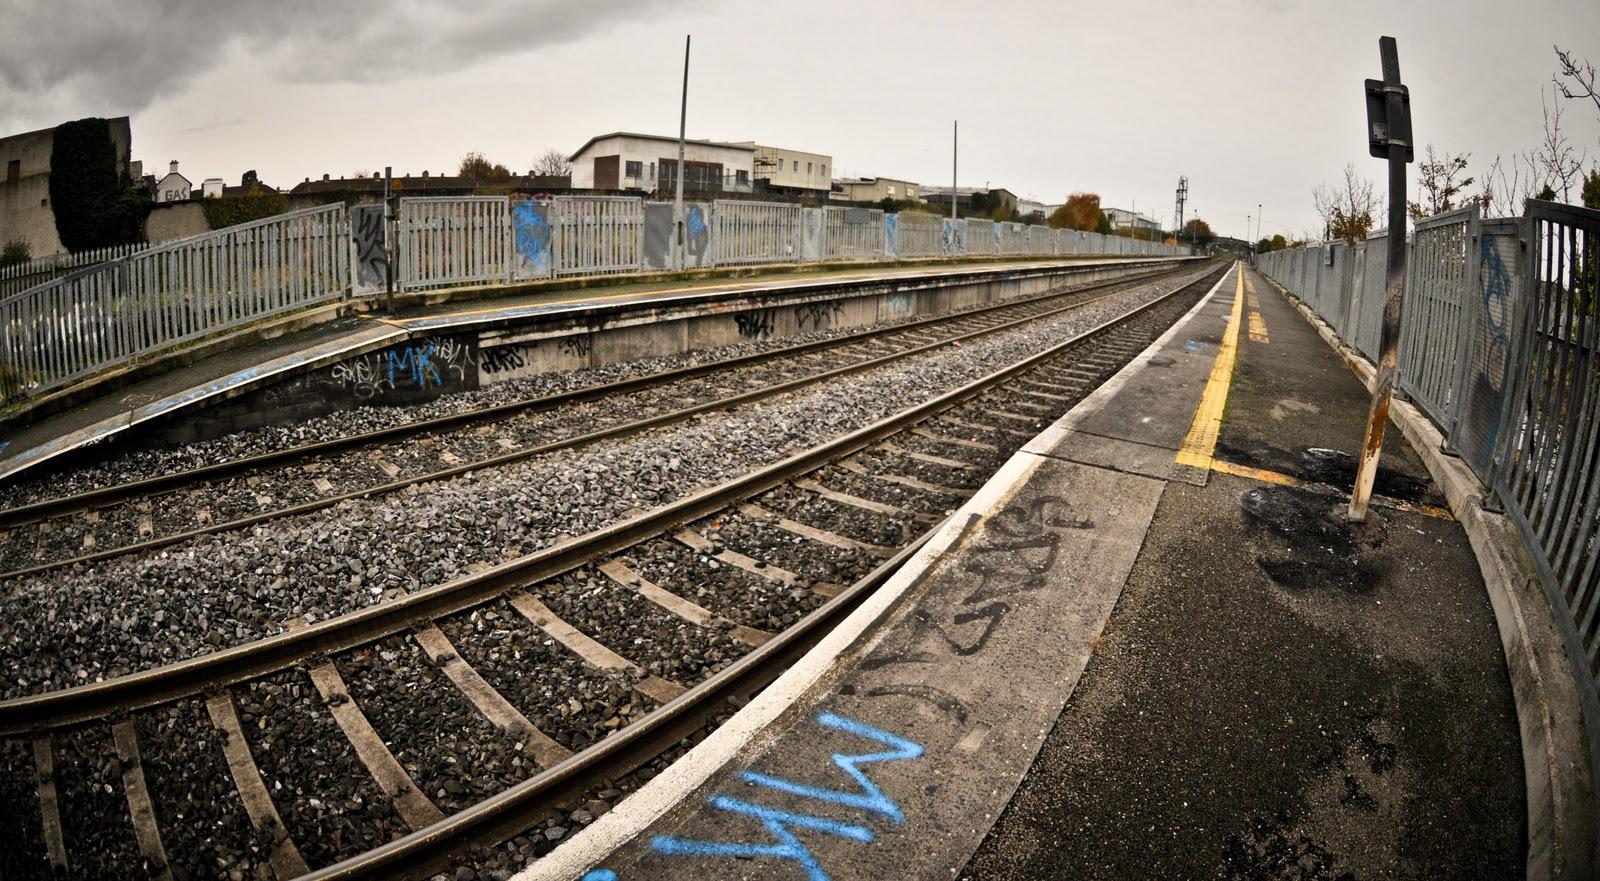 Google Dublin Broombridge Railway Station